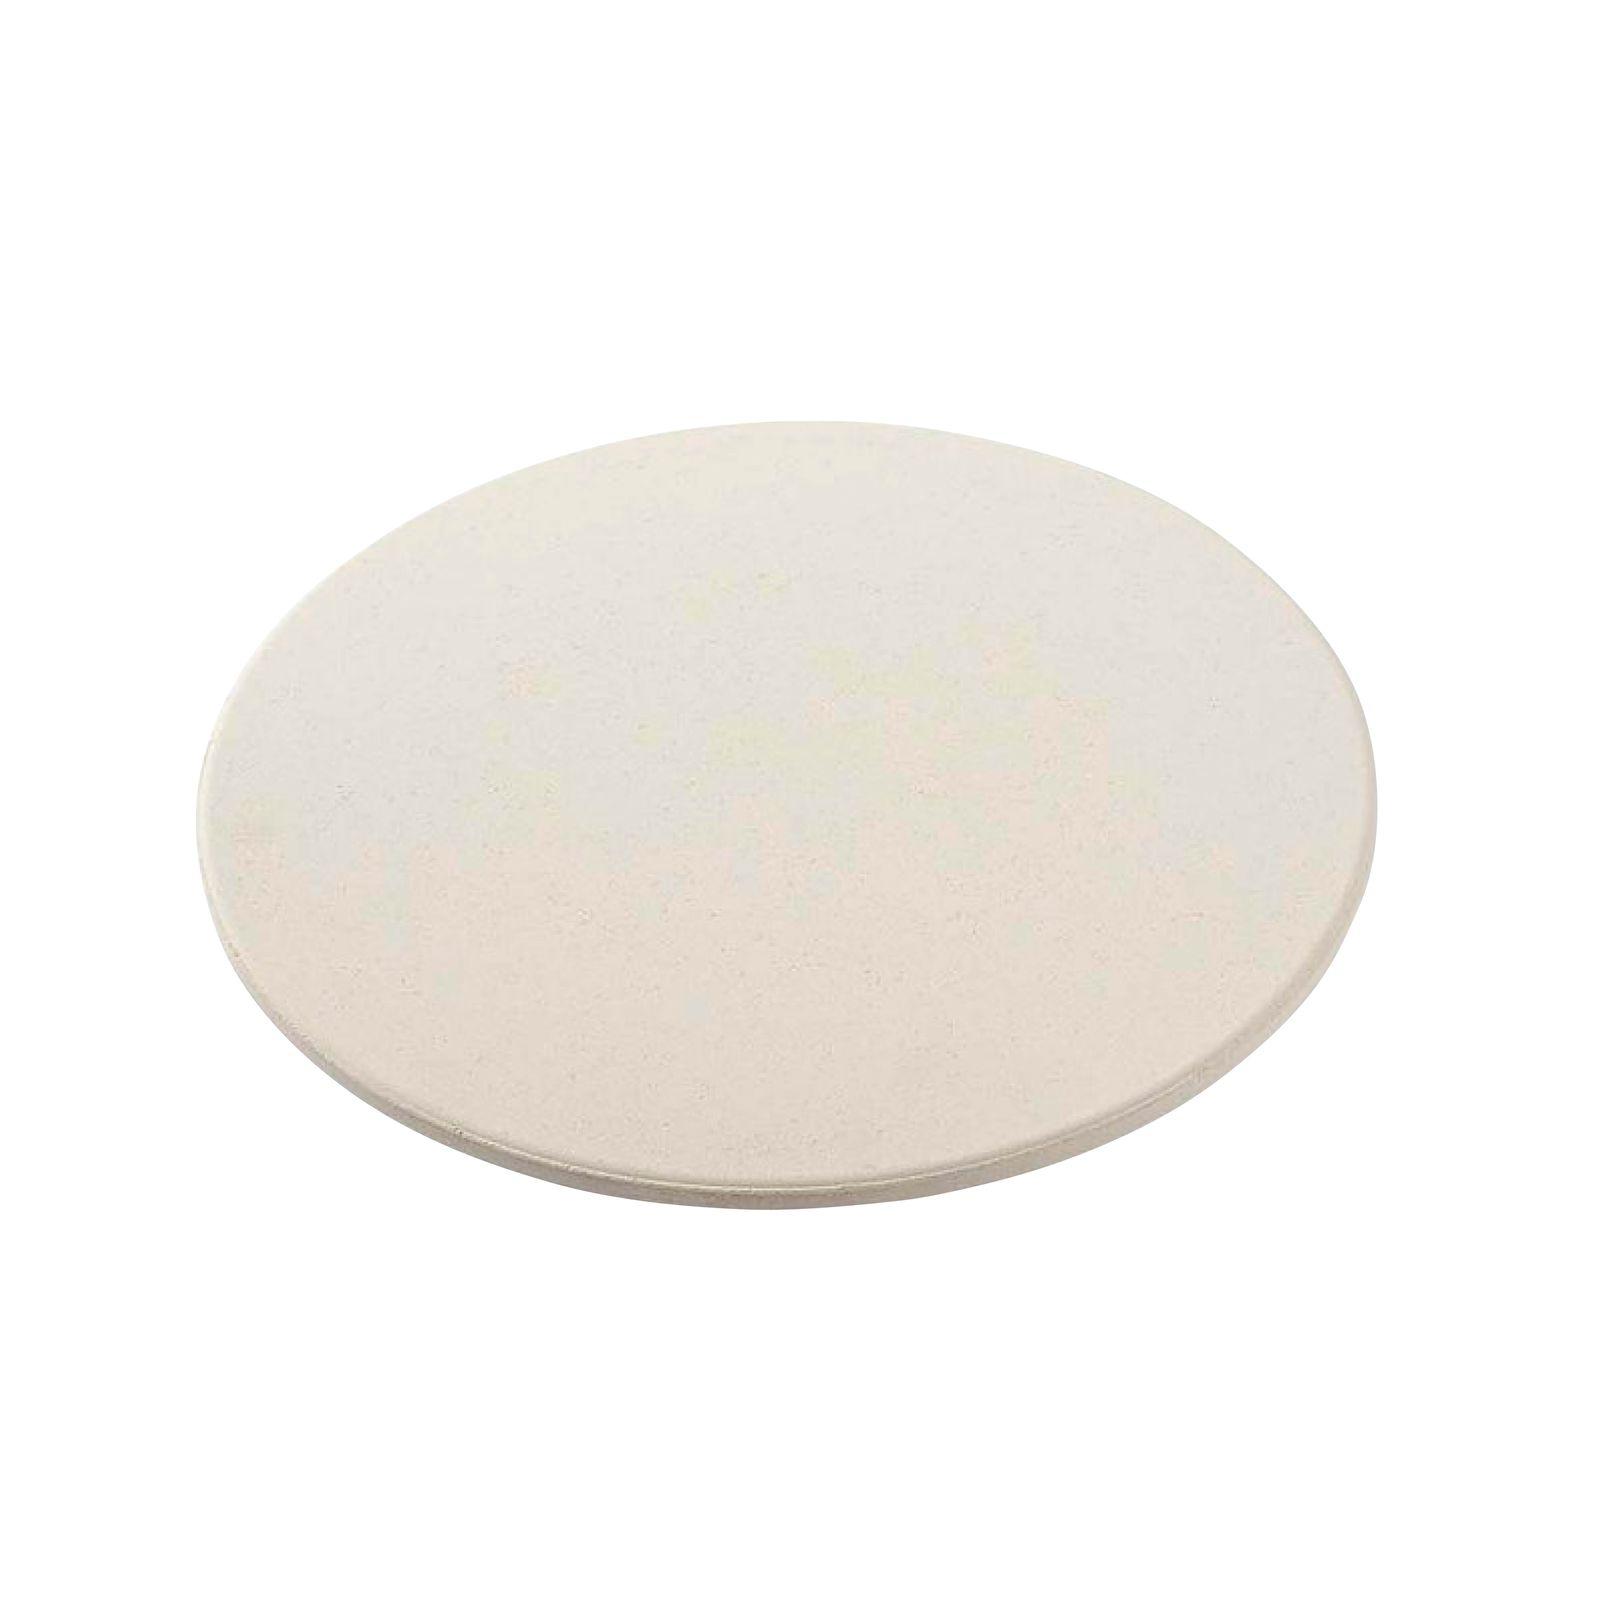 "Yakiniku compact pizza stone 14"""